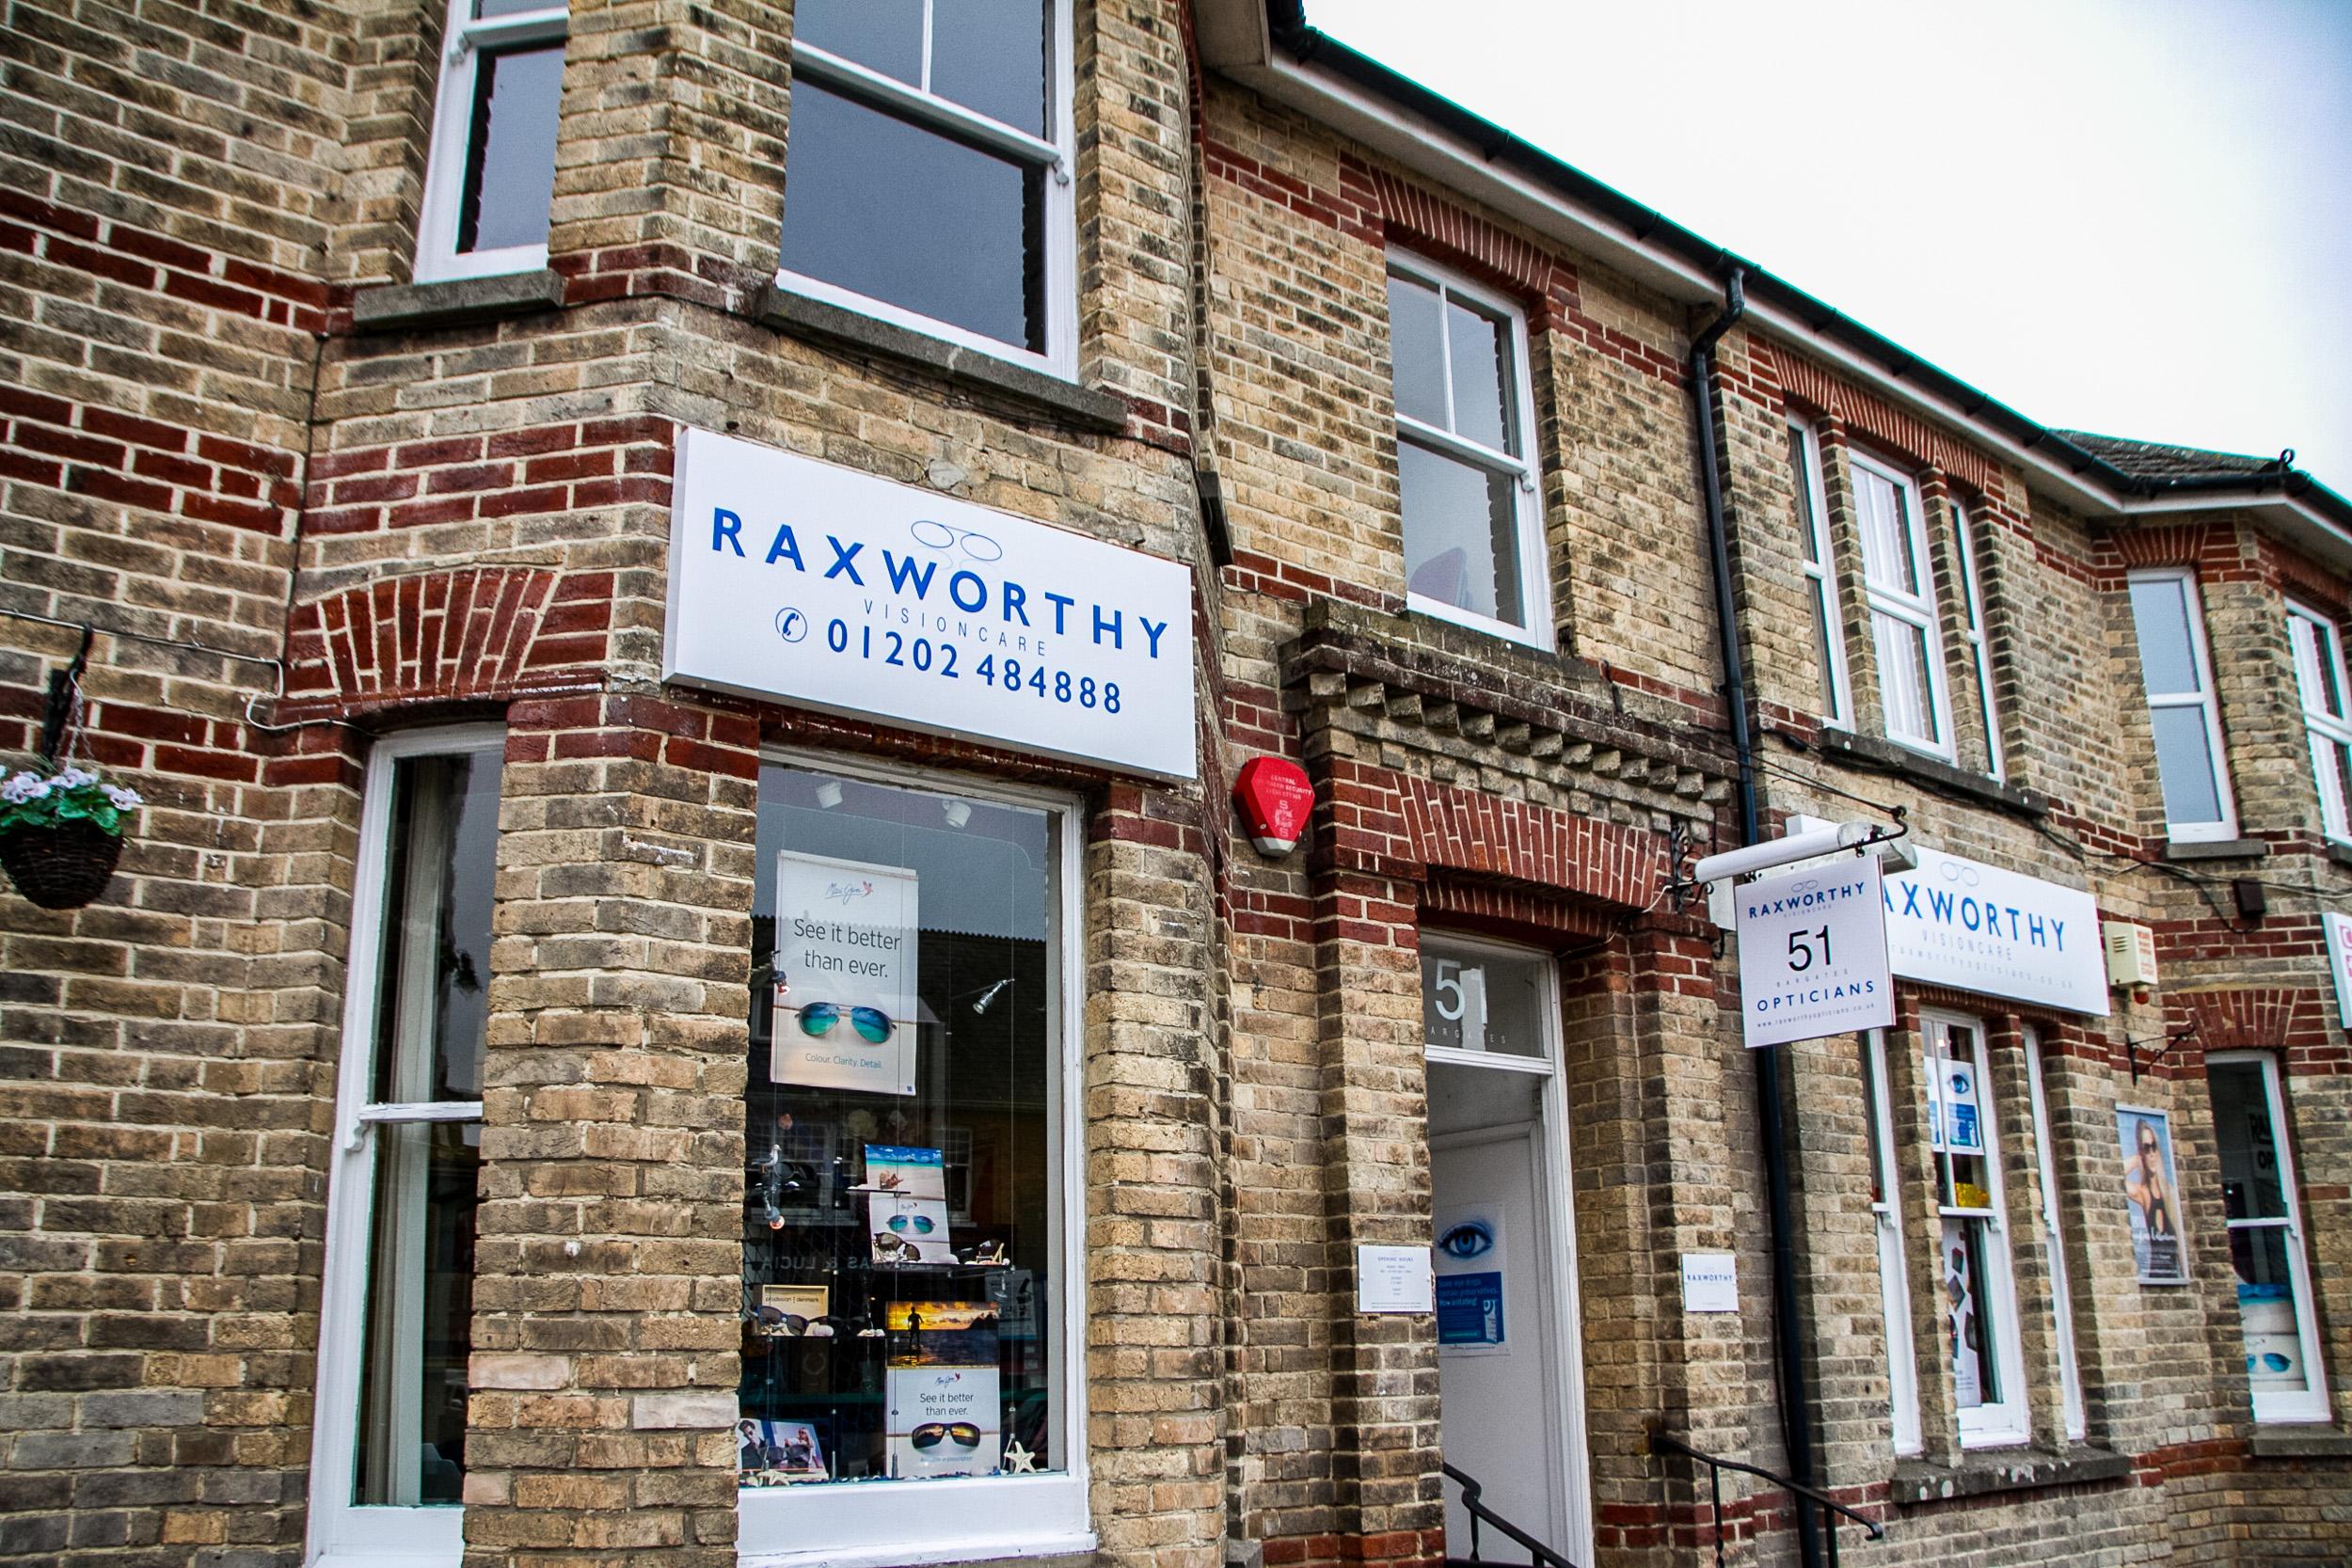 Raxworthy visioncare exterior